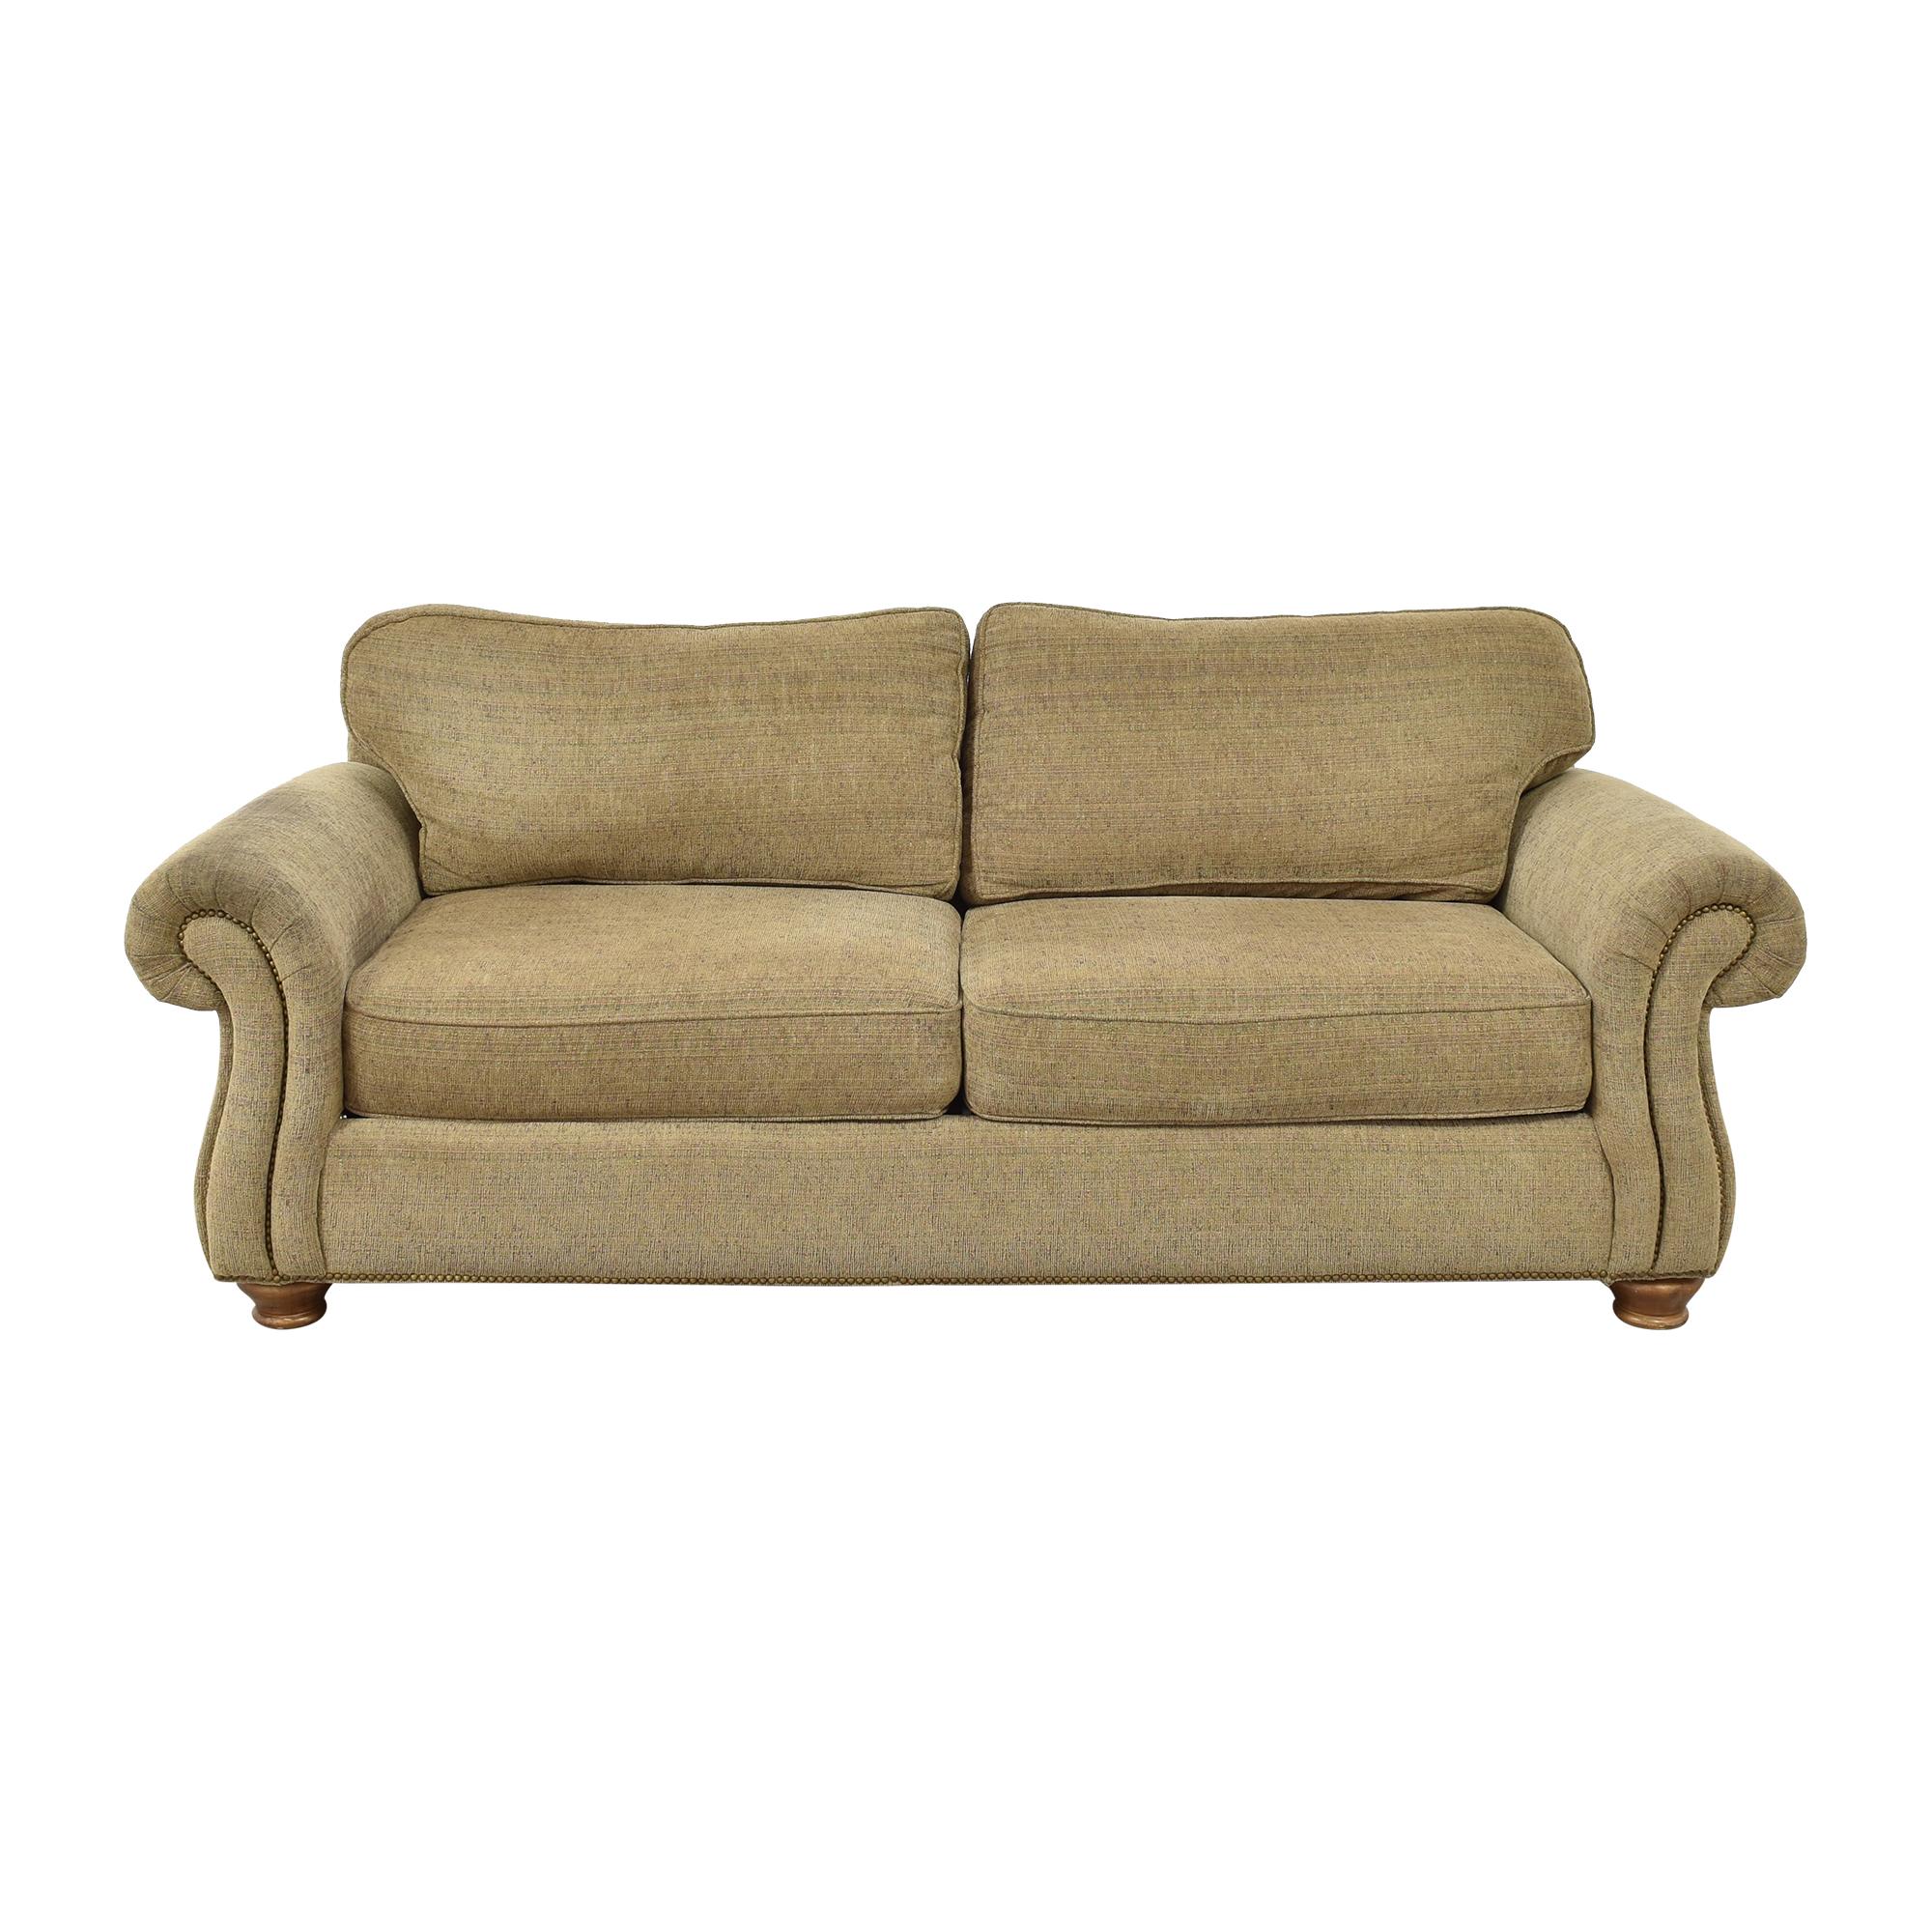 Bernhardt Bernhardt Two Cushion Roll Arm Sofa second hand